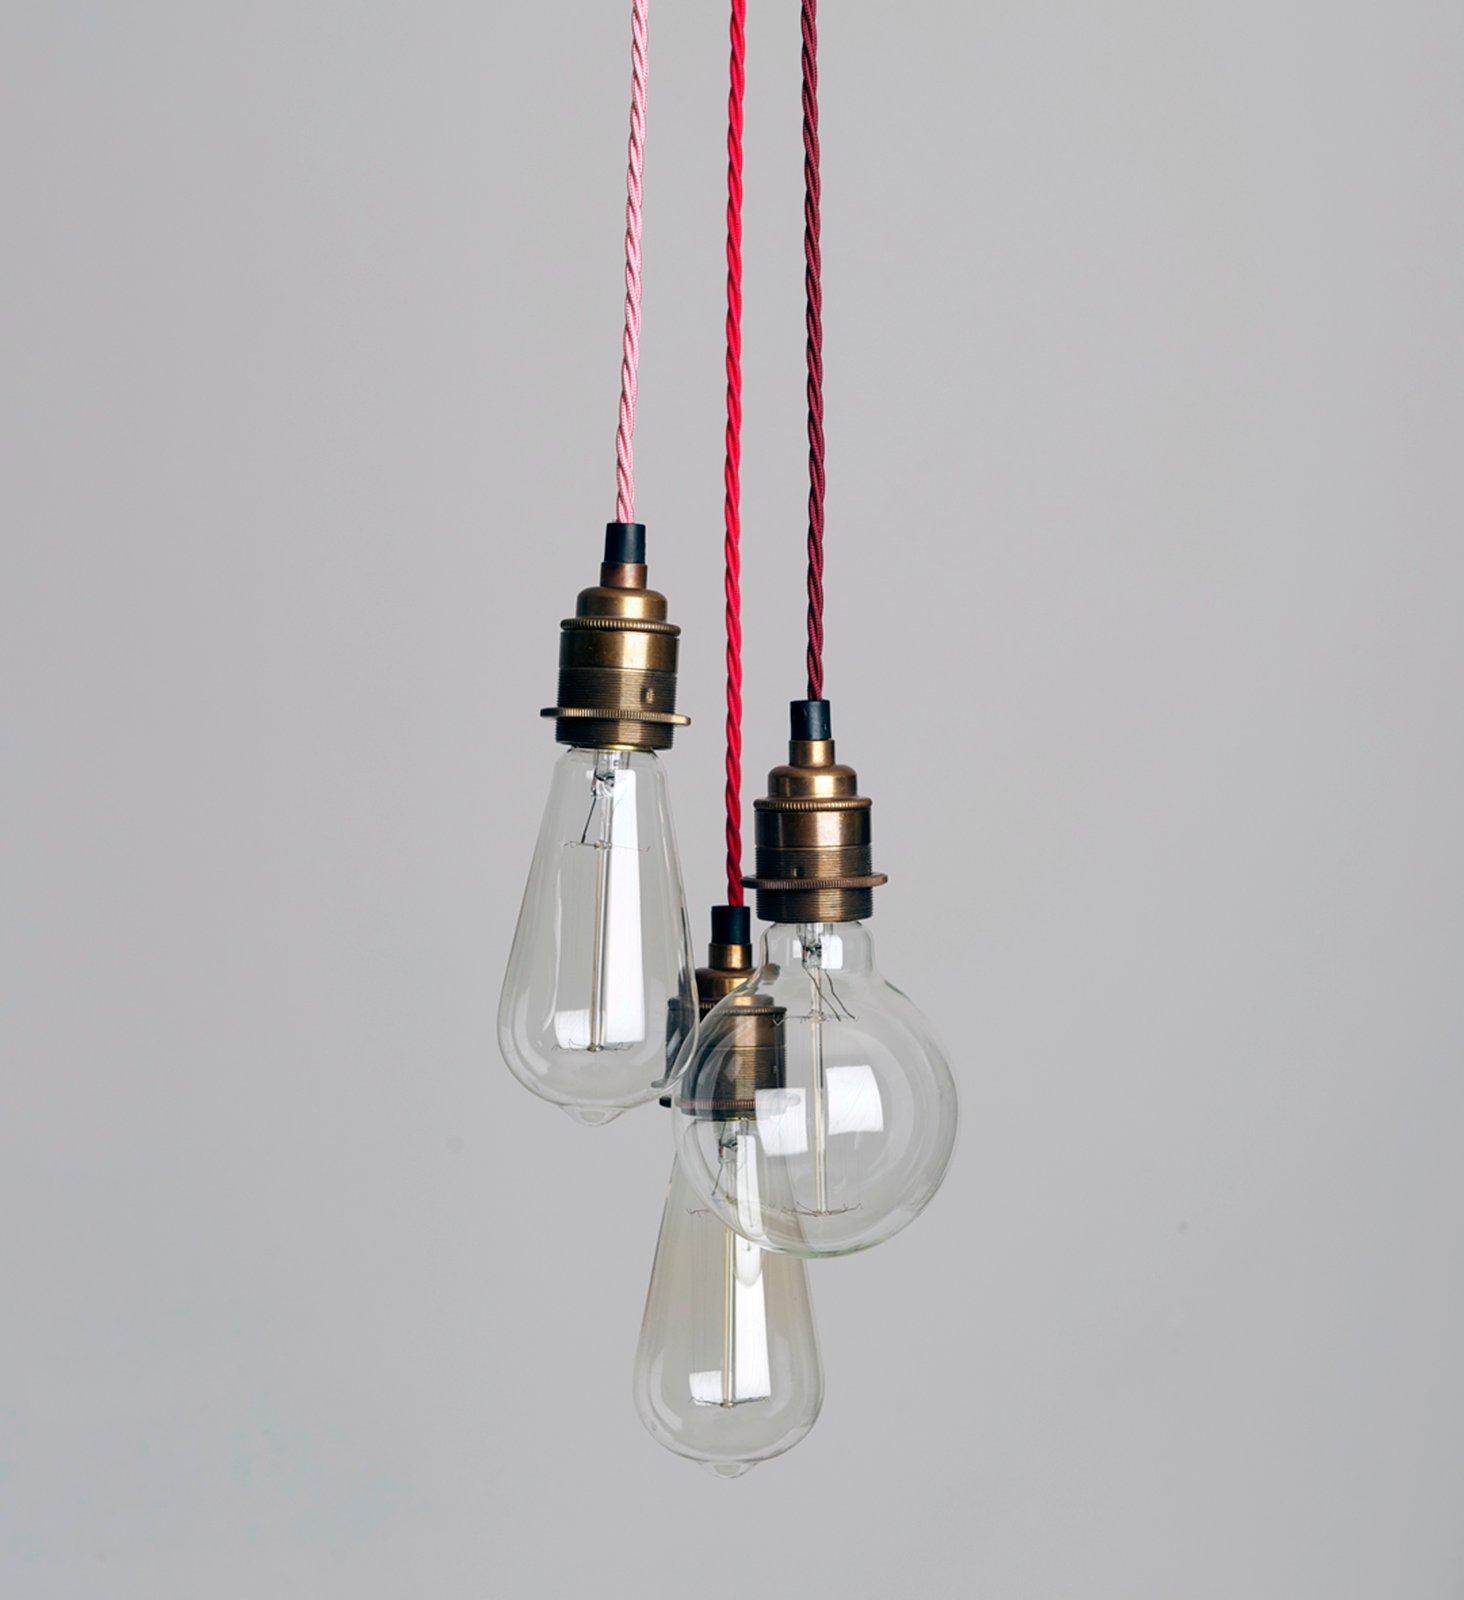 Three Strand Cluster Pendant Light H 252 Tte